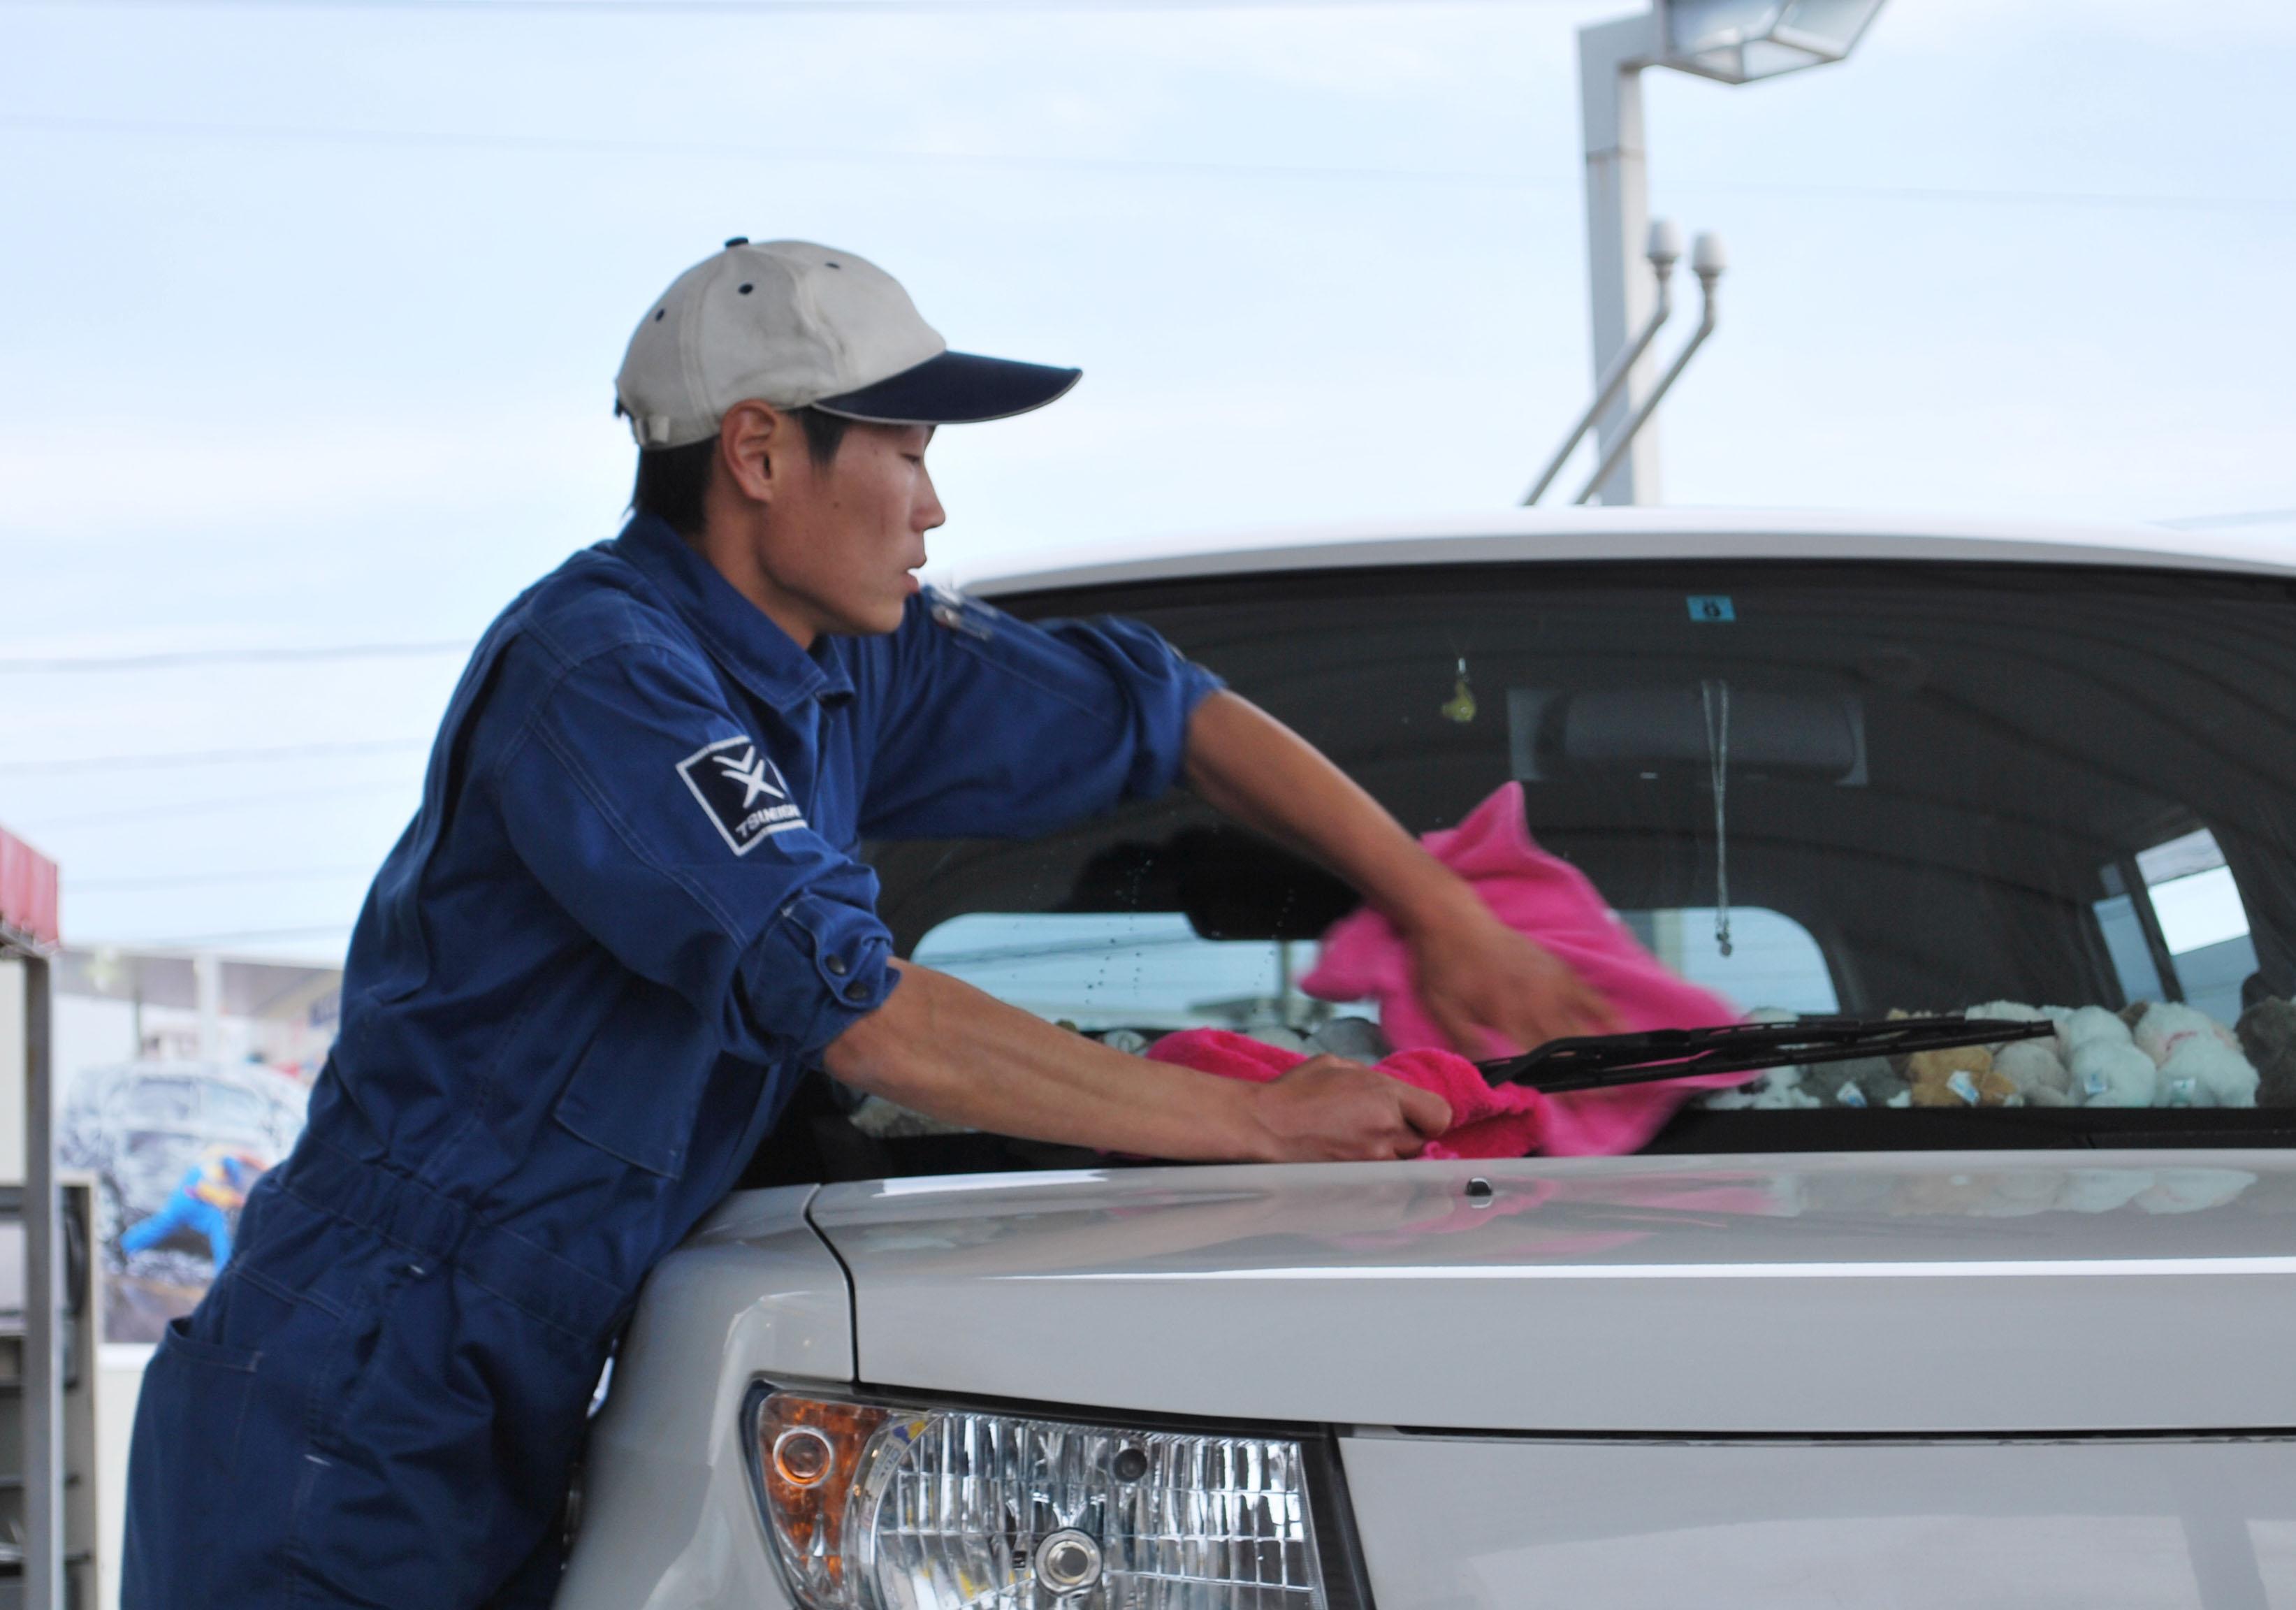 SS年末年始の営業時間のご案内-快適なカーライフをまるごとサービスするツネイシCバリューズ